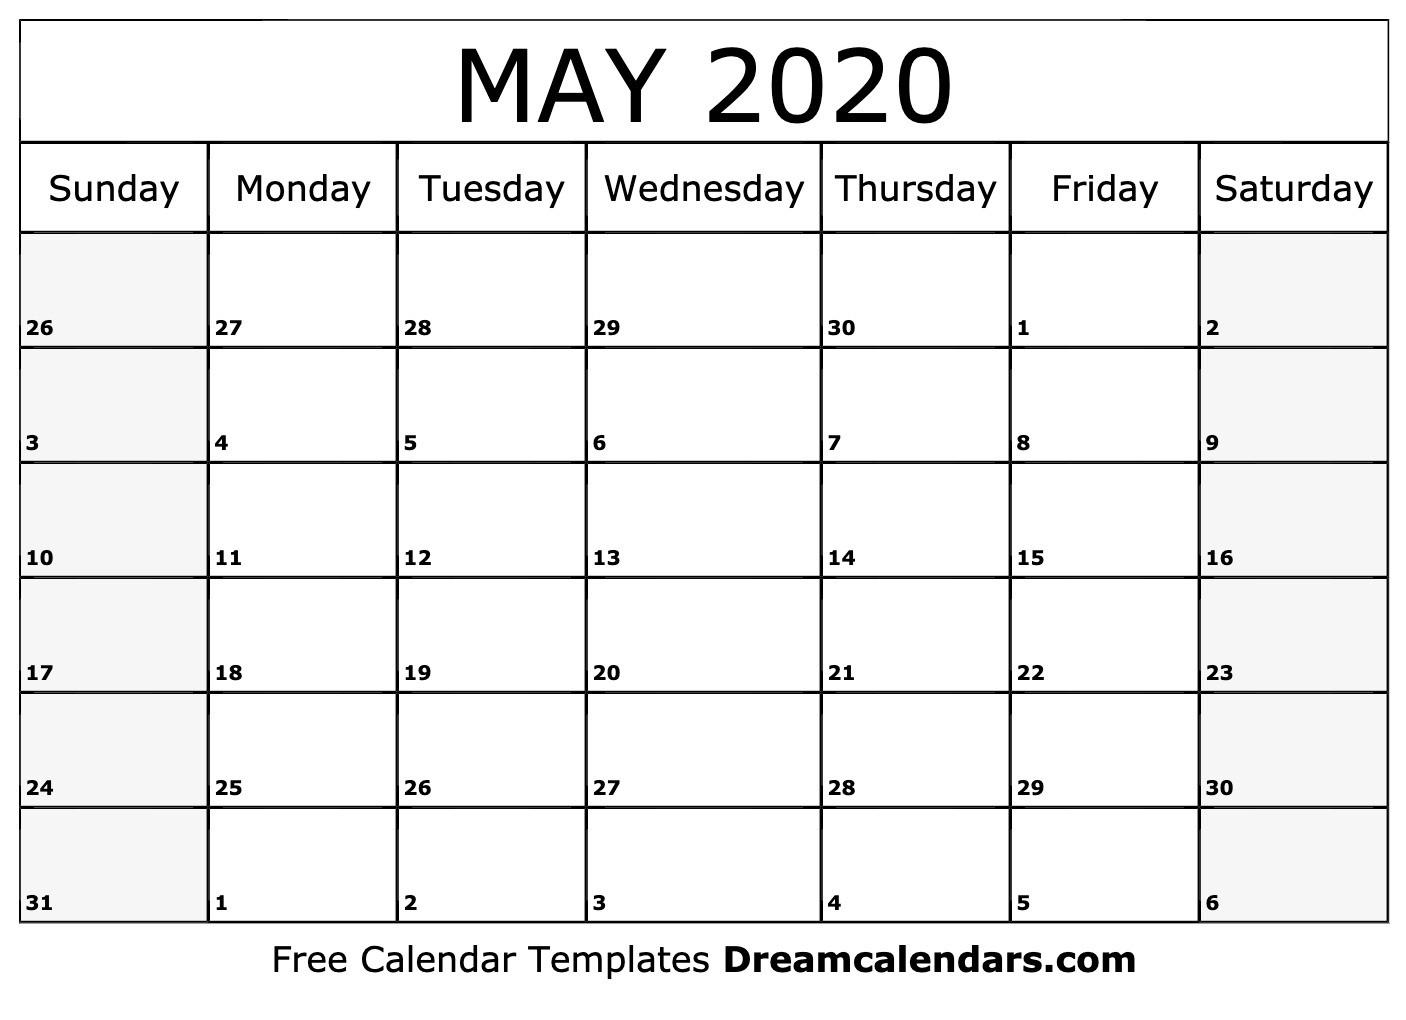 June 2020 Calendar Printable Free Blank May 2020 Printable Calendar